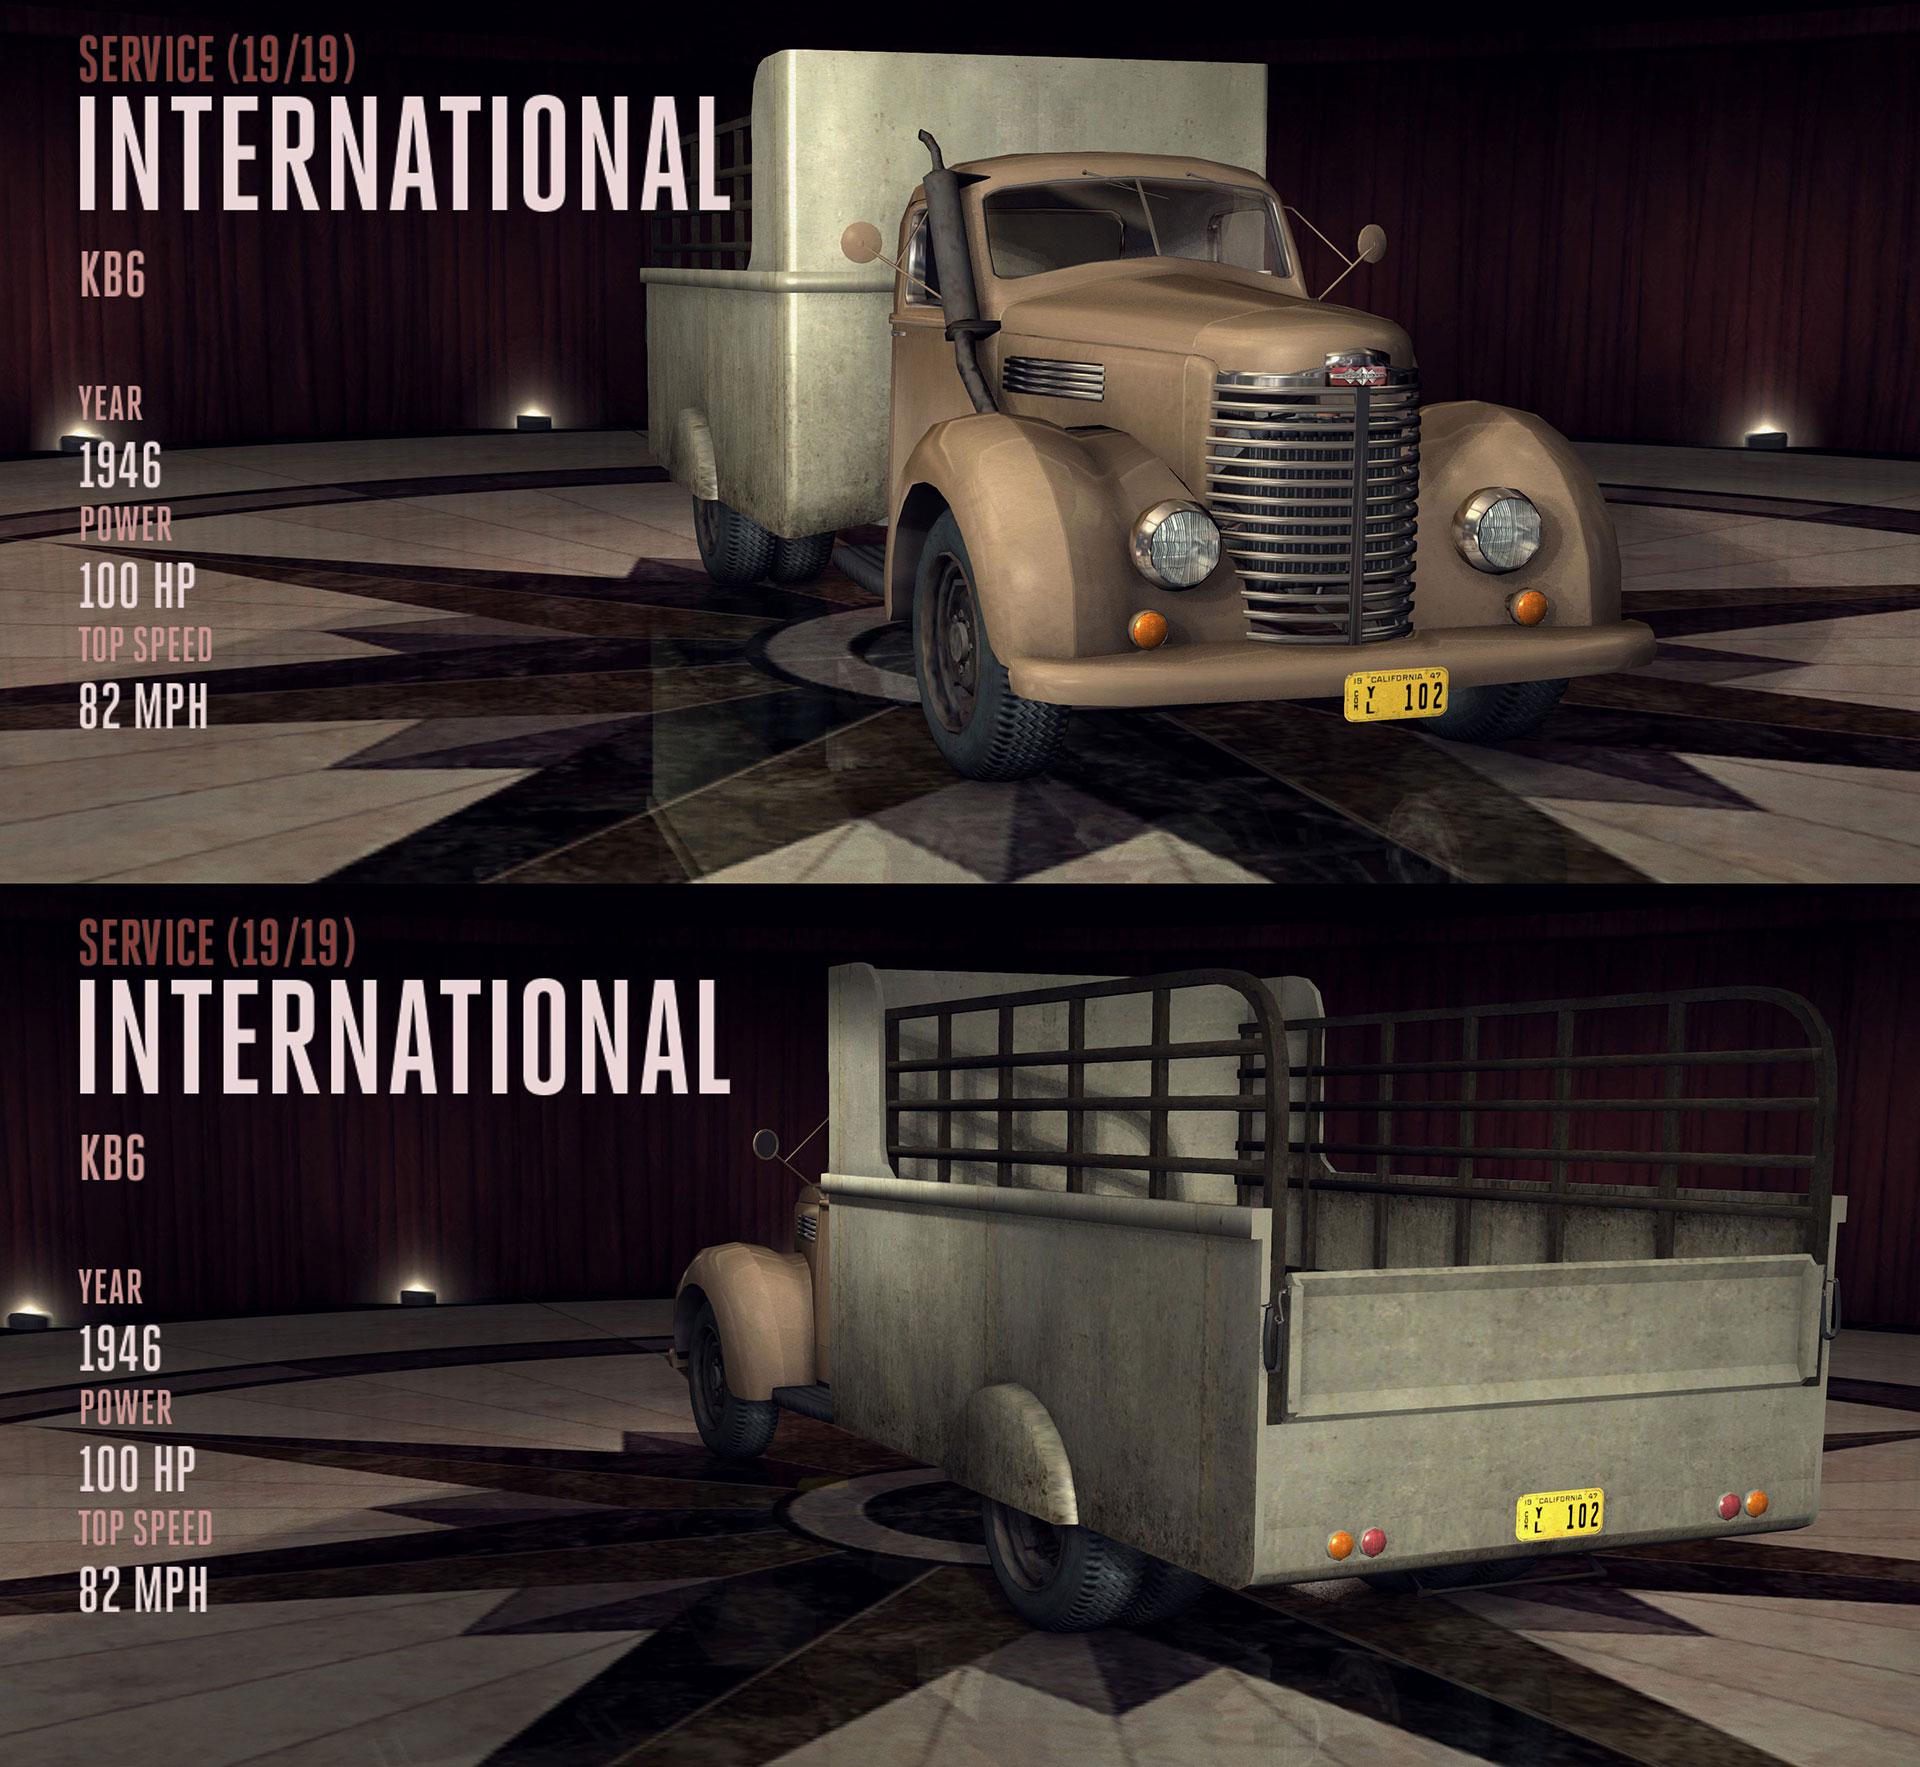 File:1946-international-kb6.jpg